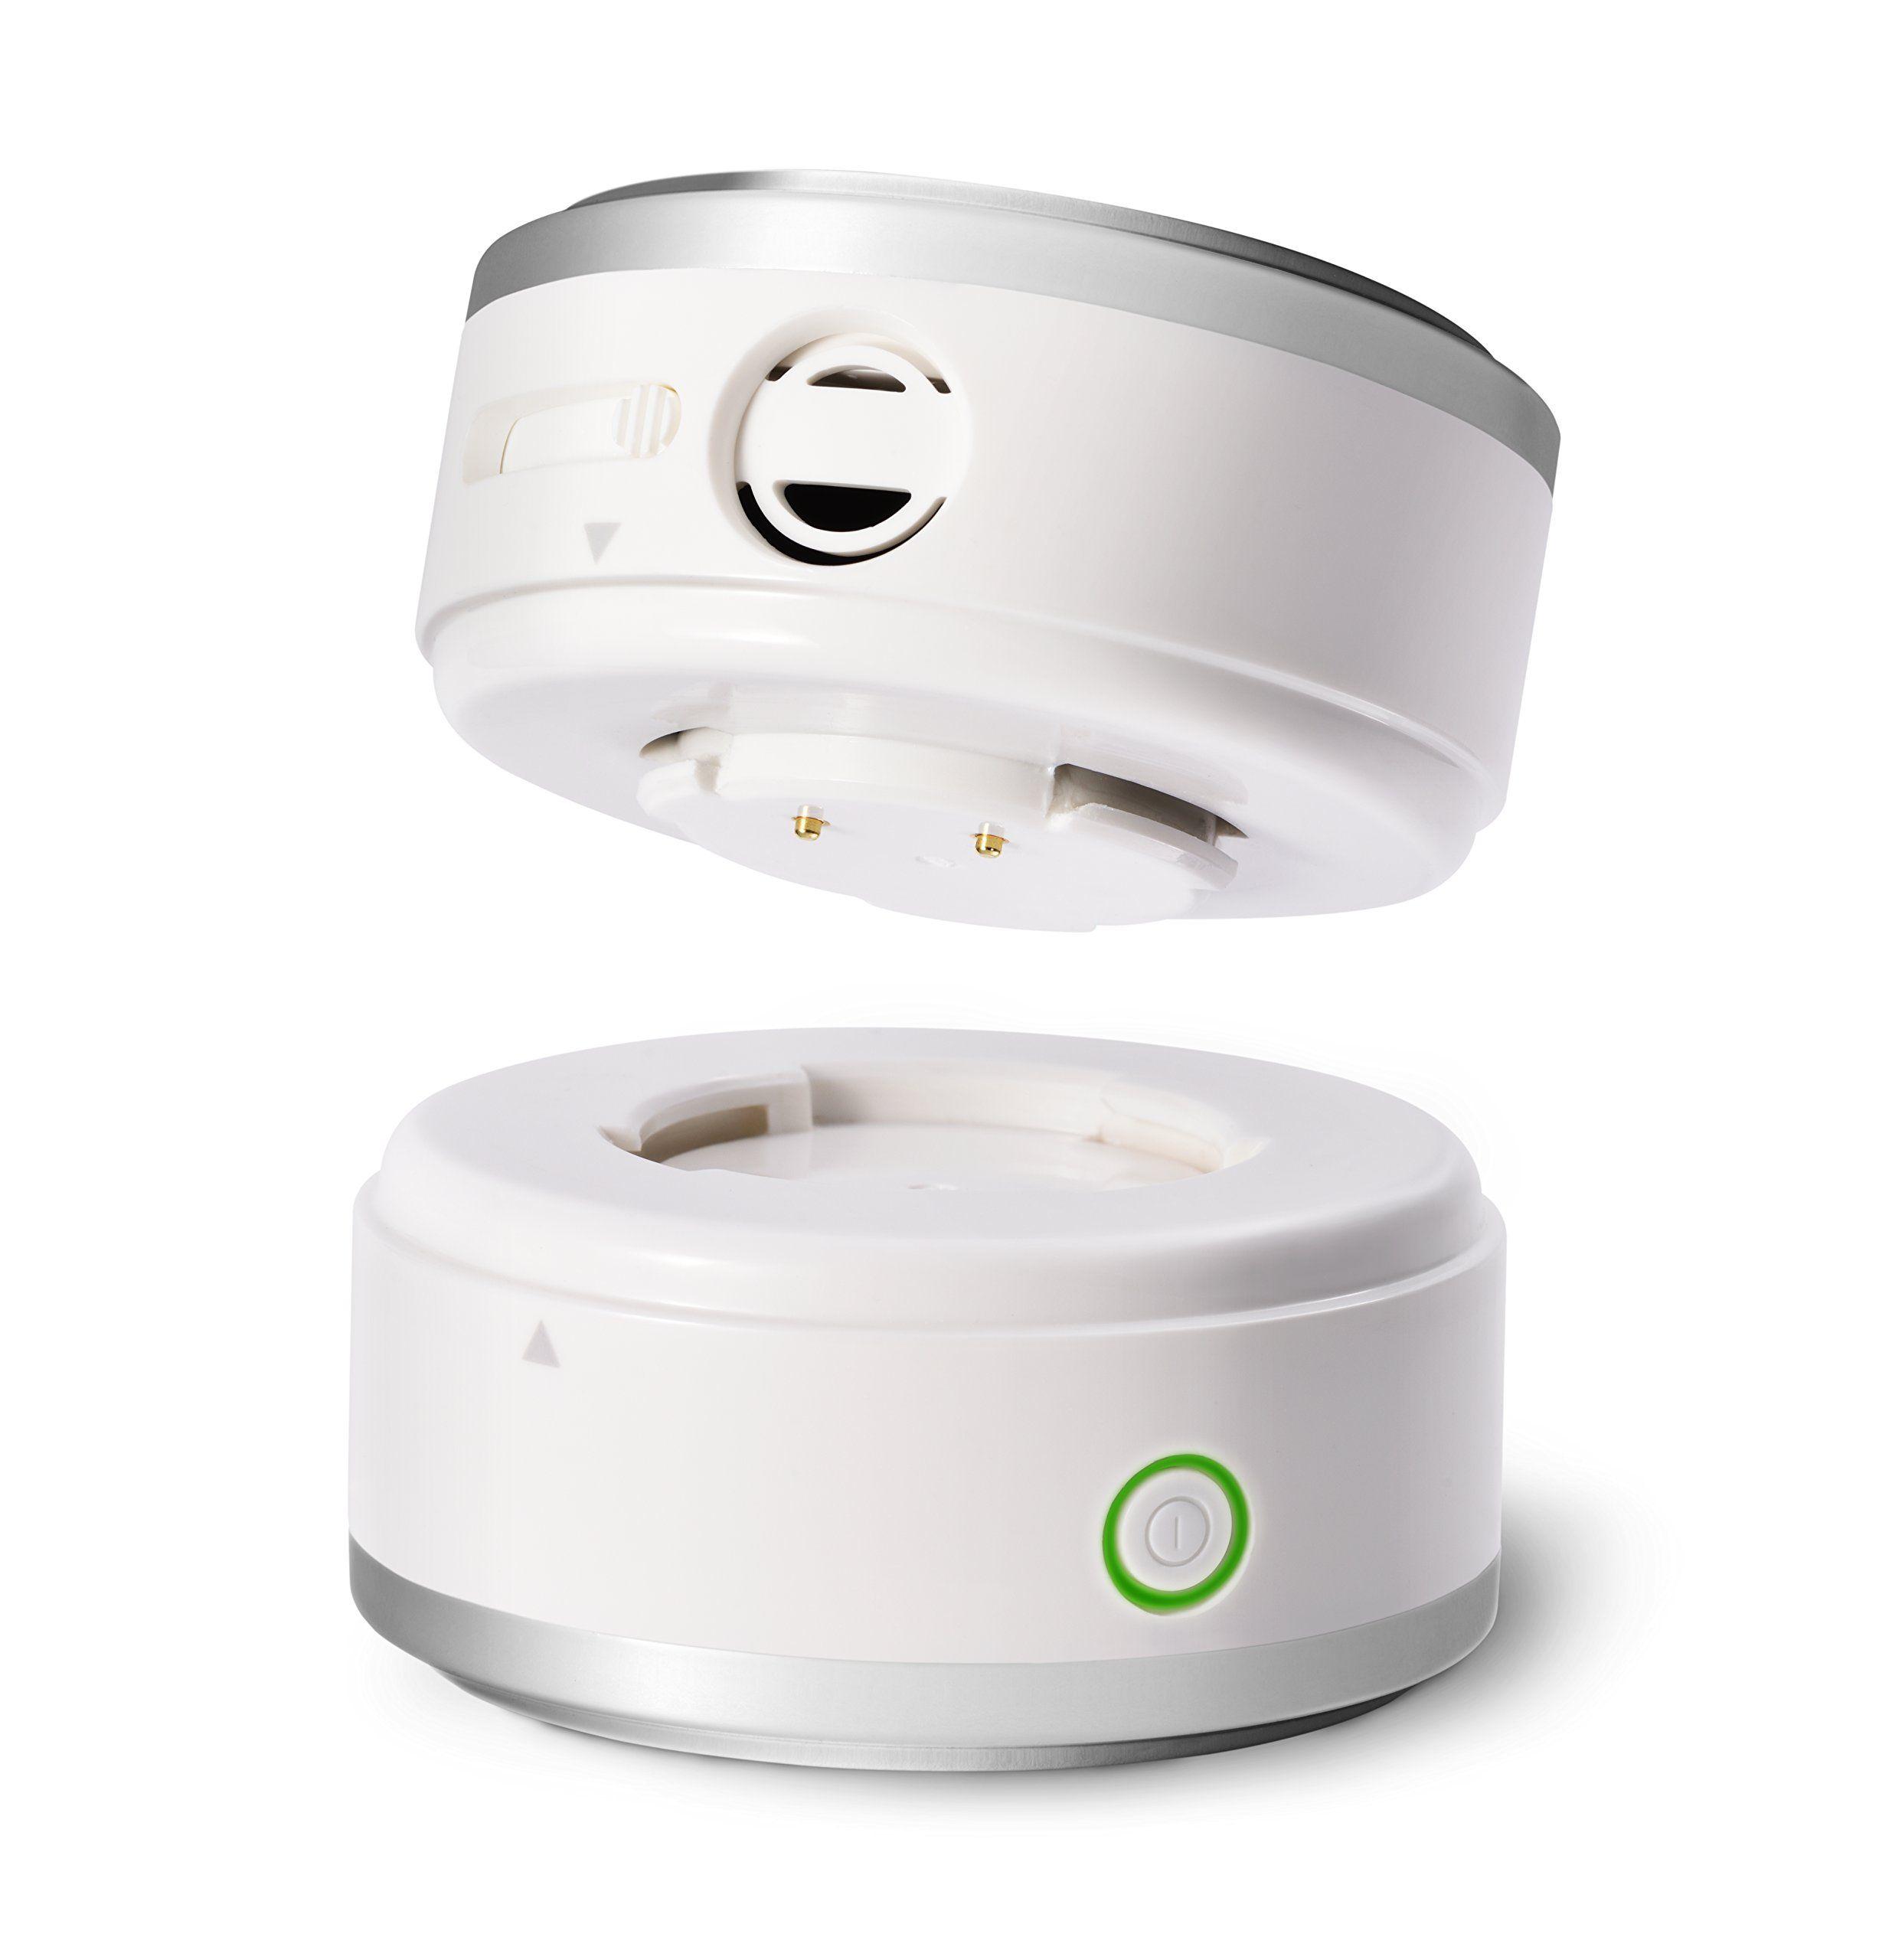 FitAir Personal Air Purifier. Bring Clean Air with You